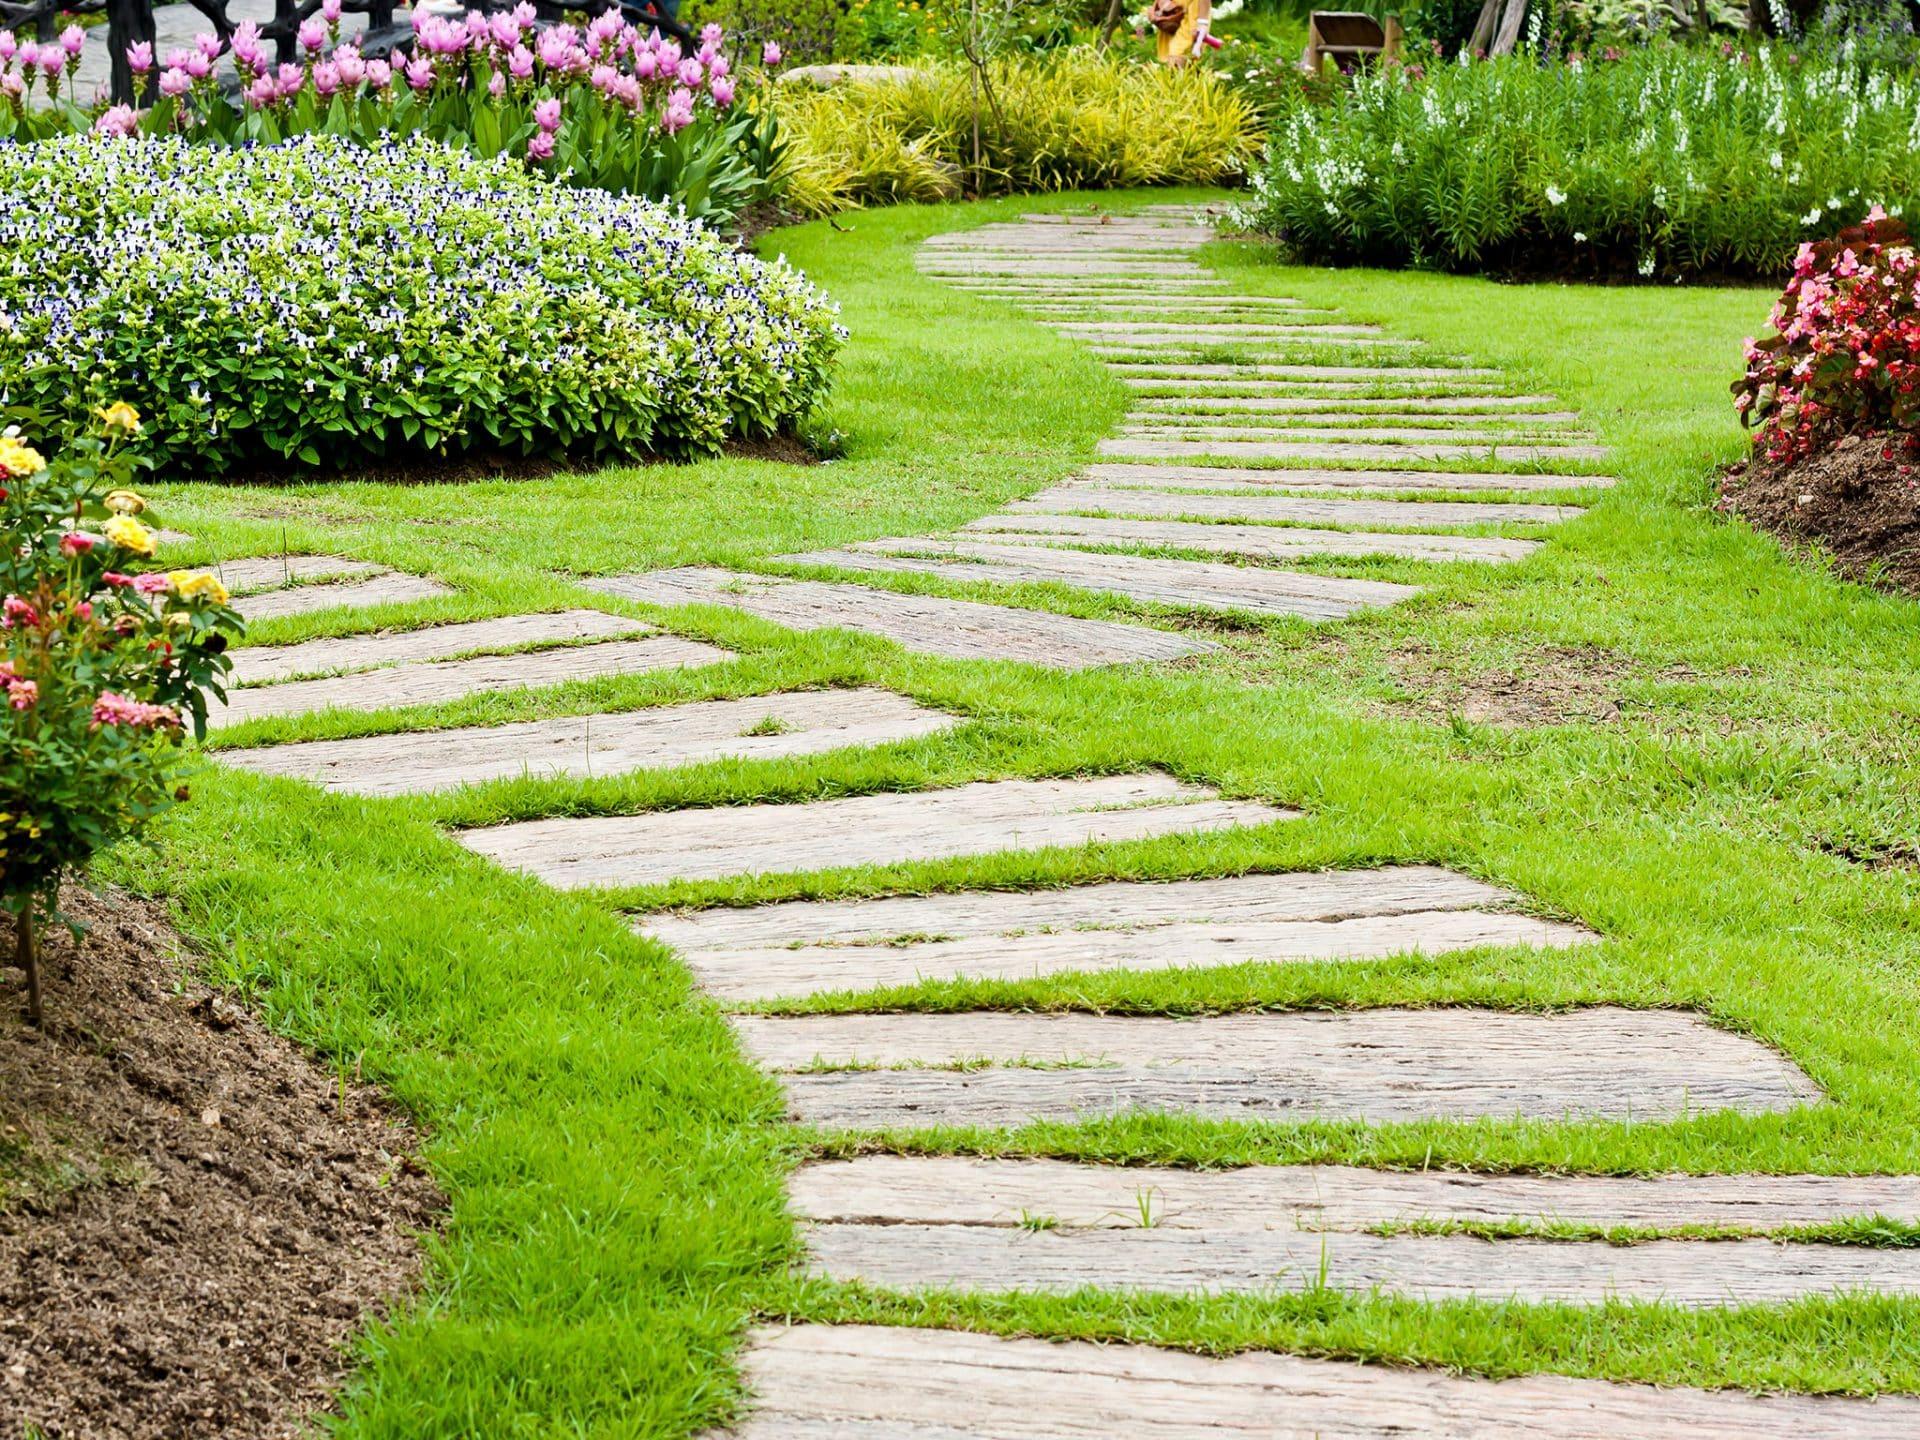 Gartenweg aus Holzschwellen ohne Randbegrenzung © Shutterstock - Pheniti Prasomphethiran